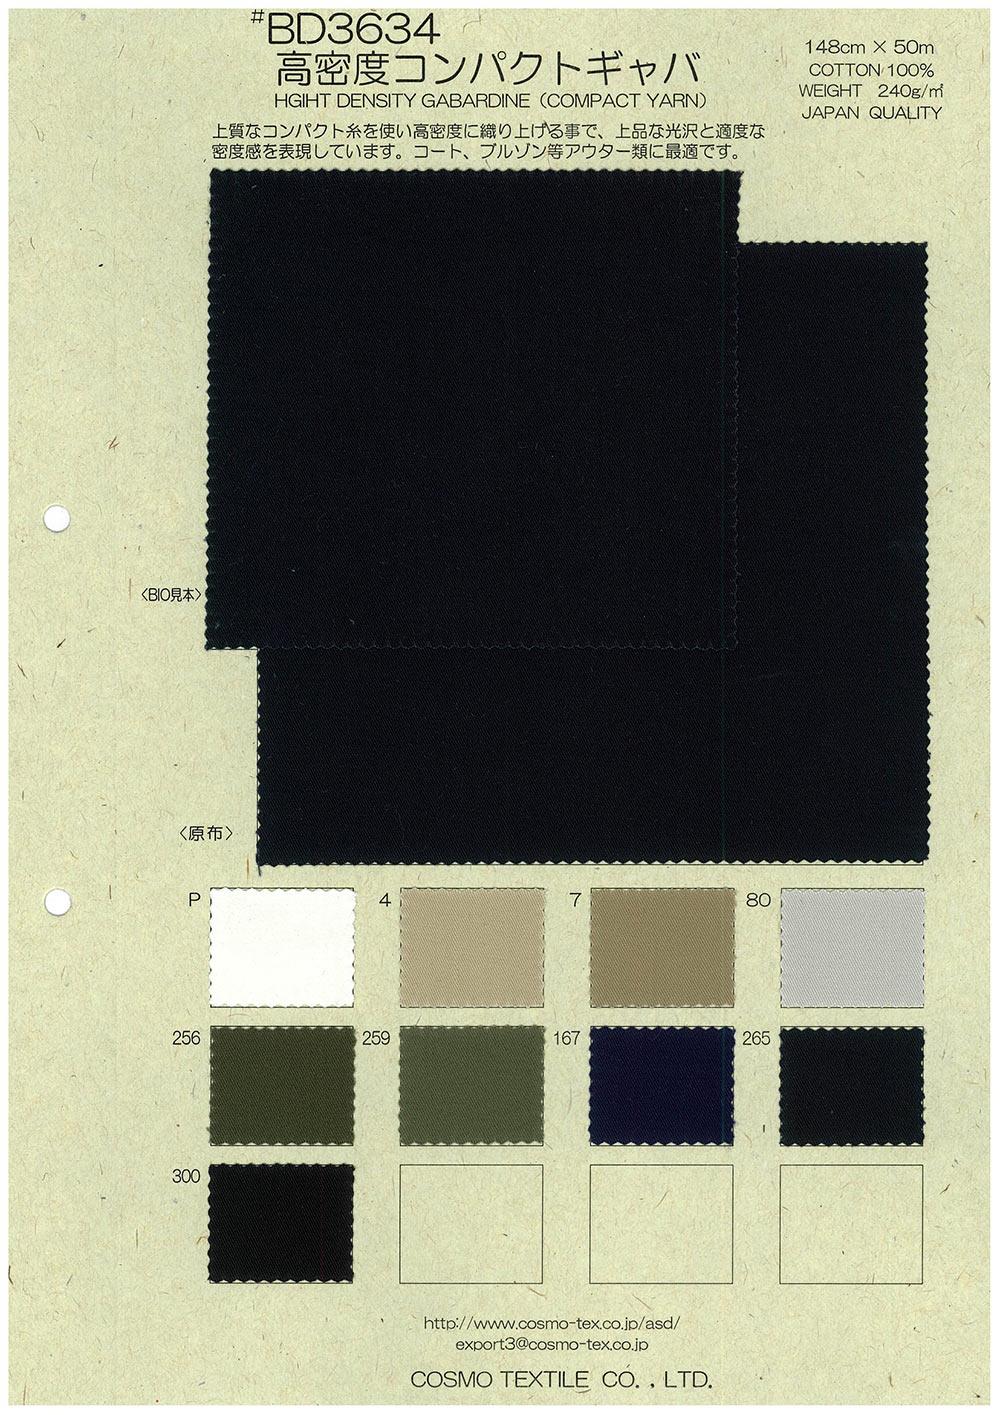 BD3634 コンパクトギャバ[生地] コスモテキスタイル/オークラ商事 - ApparelX アパレル資材卸通販